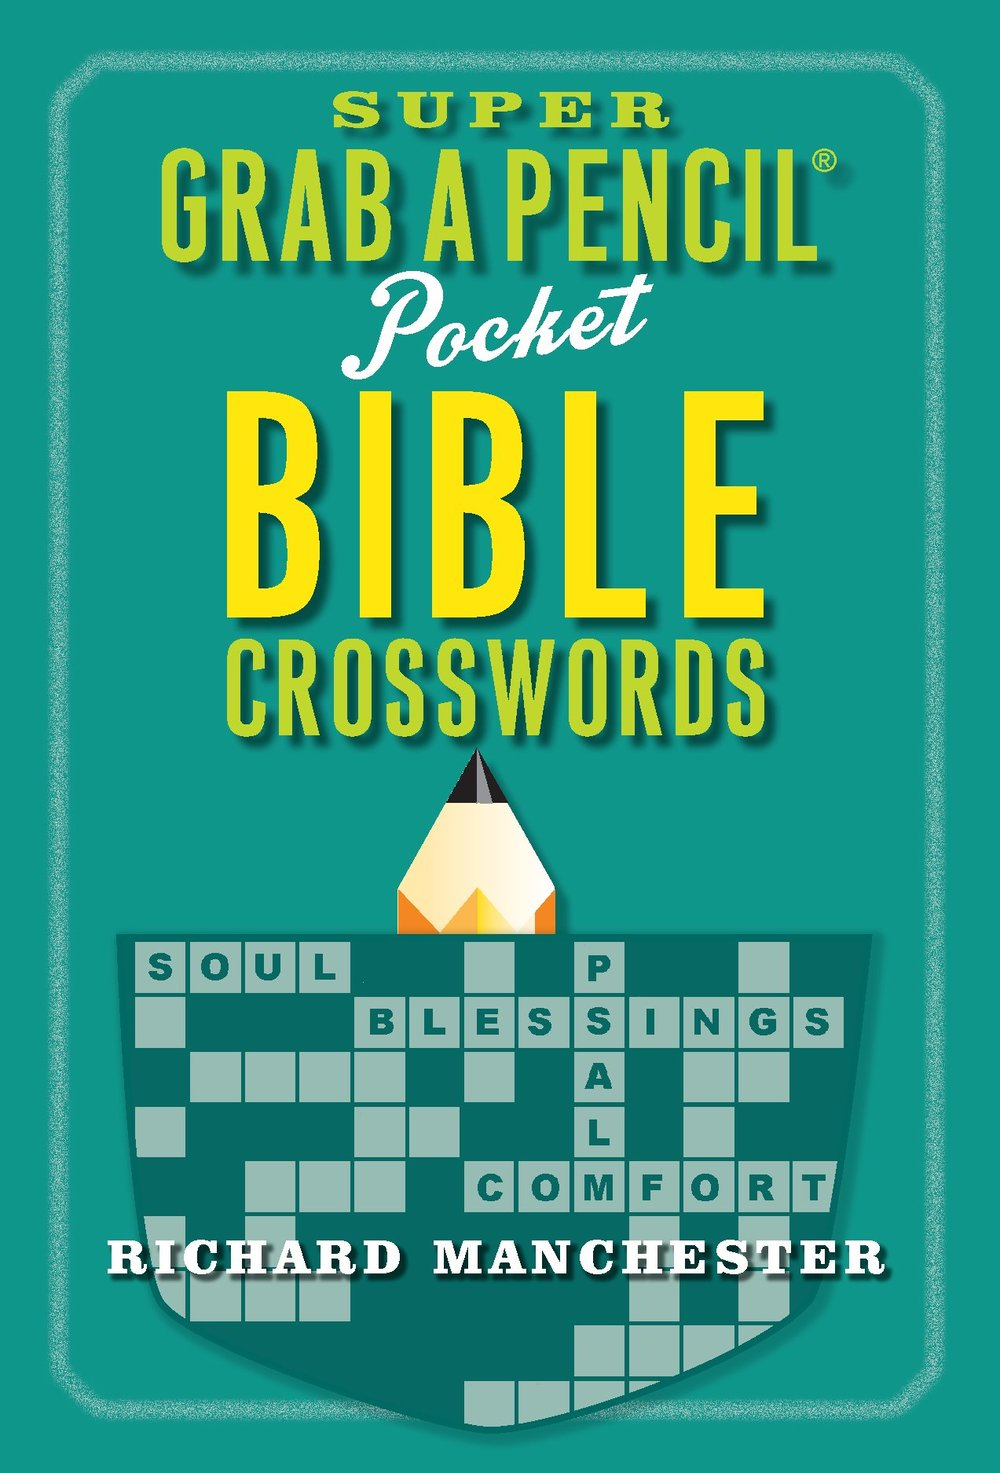 Pocket Bible 3D.jpg